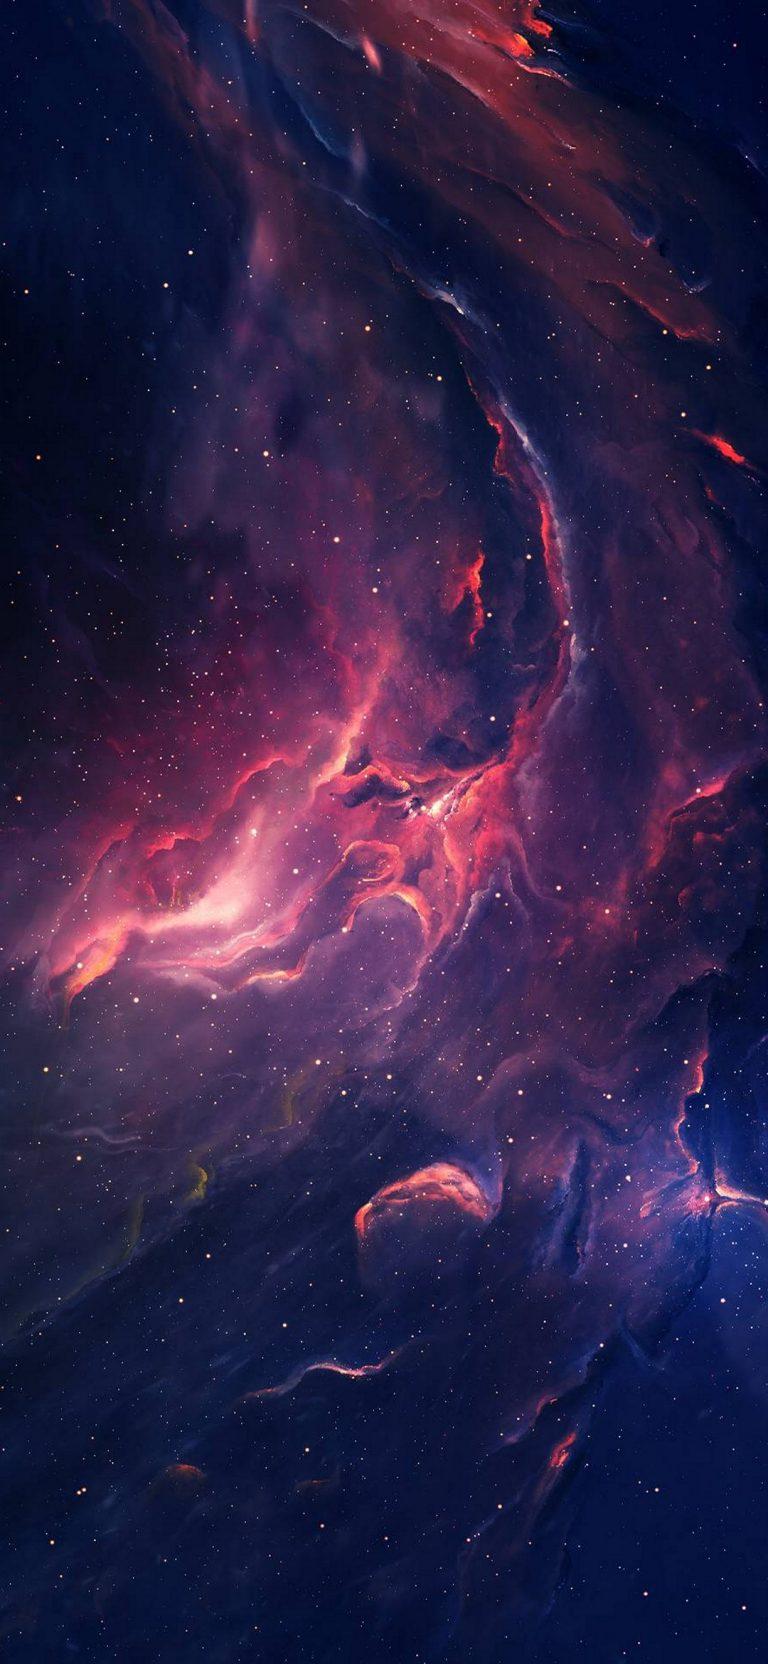 Space Phone Wallpaper 129 1080x2340 768x1664